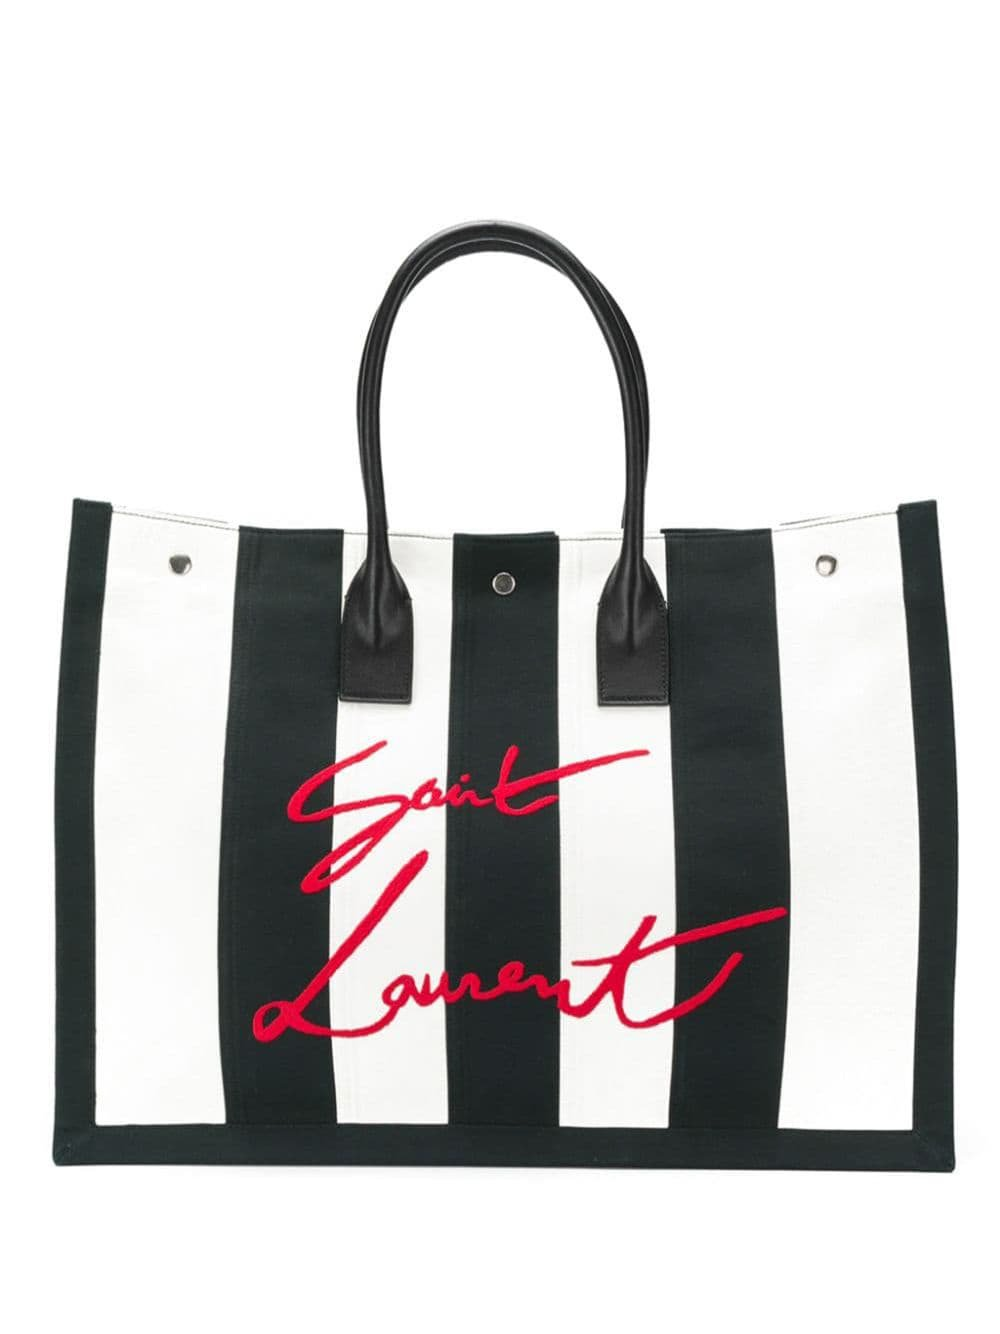 Saint Laurent Noe Tote Bag | Farfetch.com